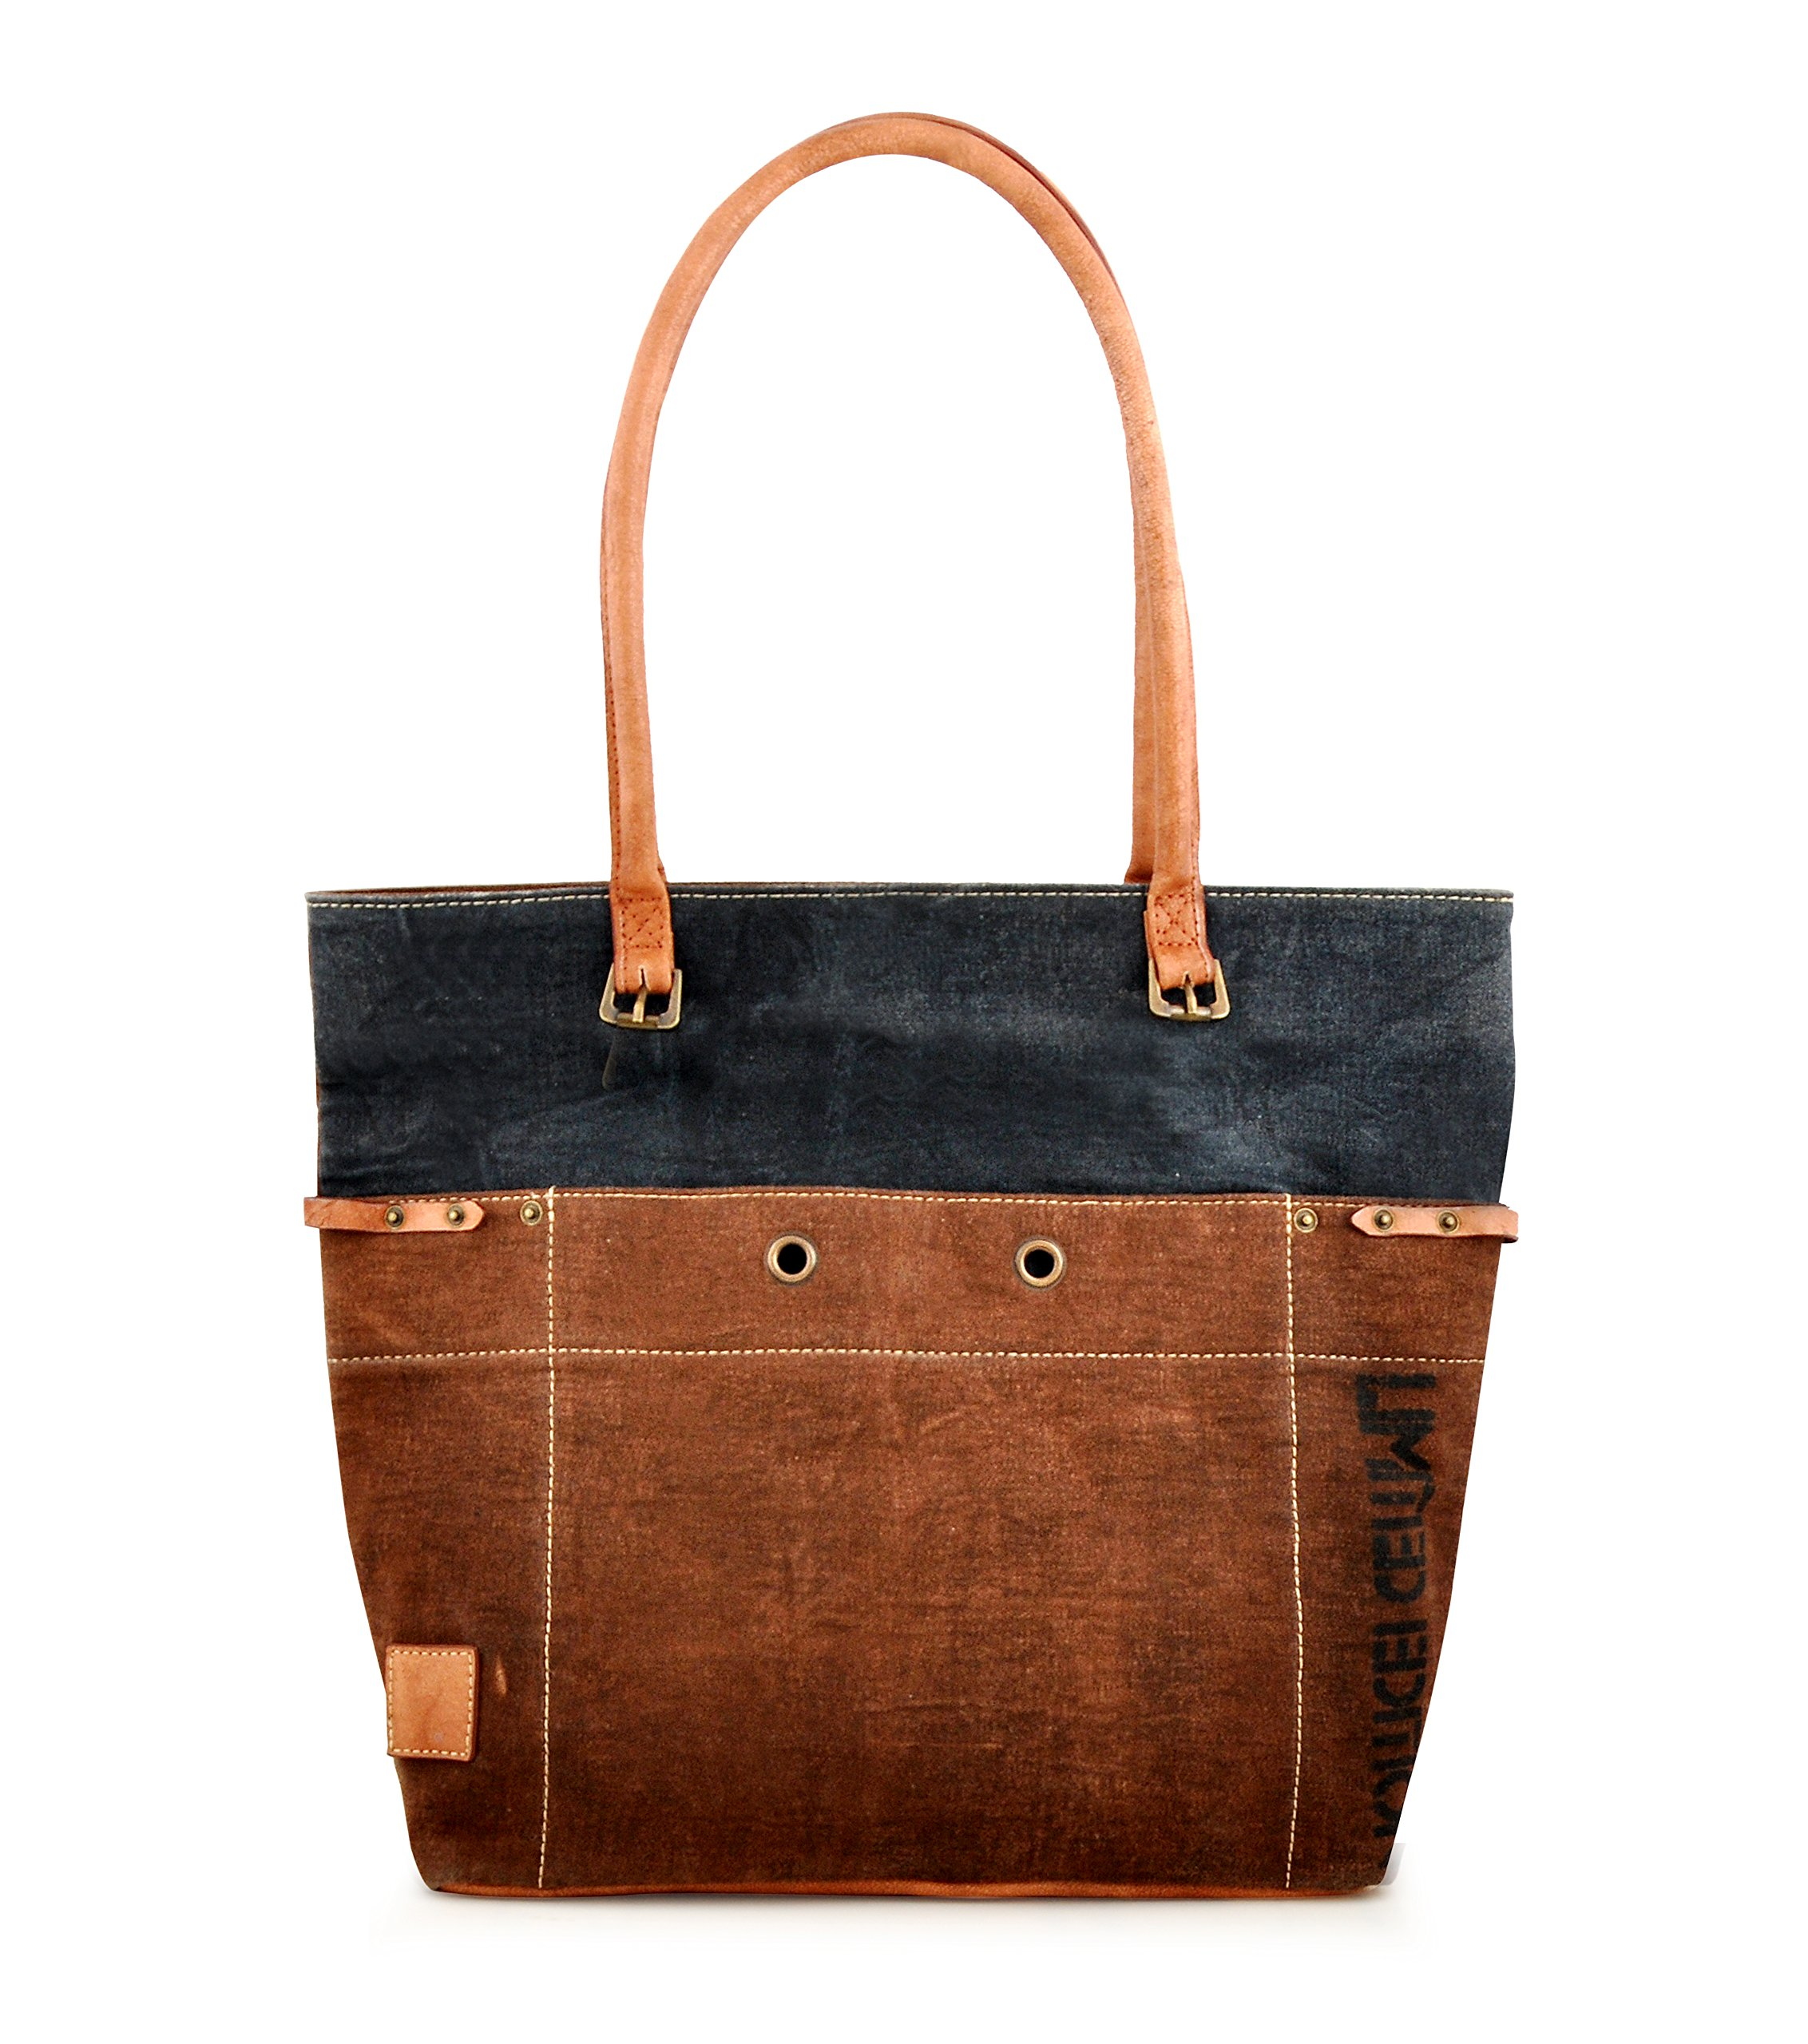 Canvas Tote bag for Women Girls Leather Trims Work Travel Shopper Backpack Cross body Hobo Messenger Shoulder Purse by Daphne